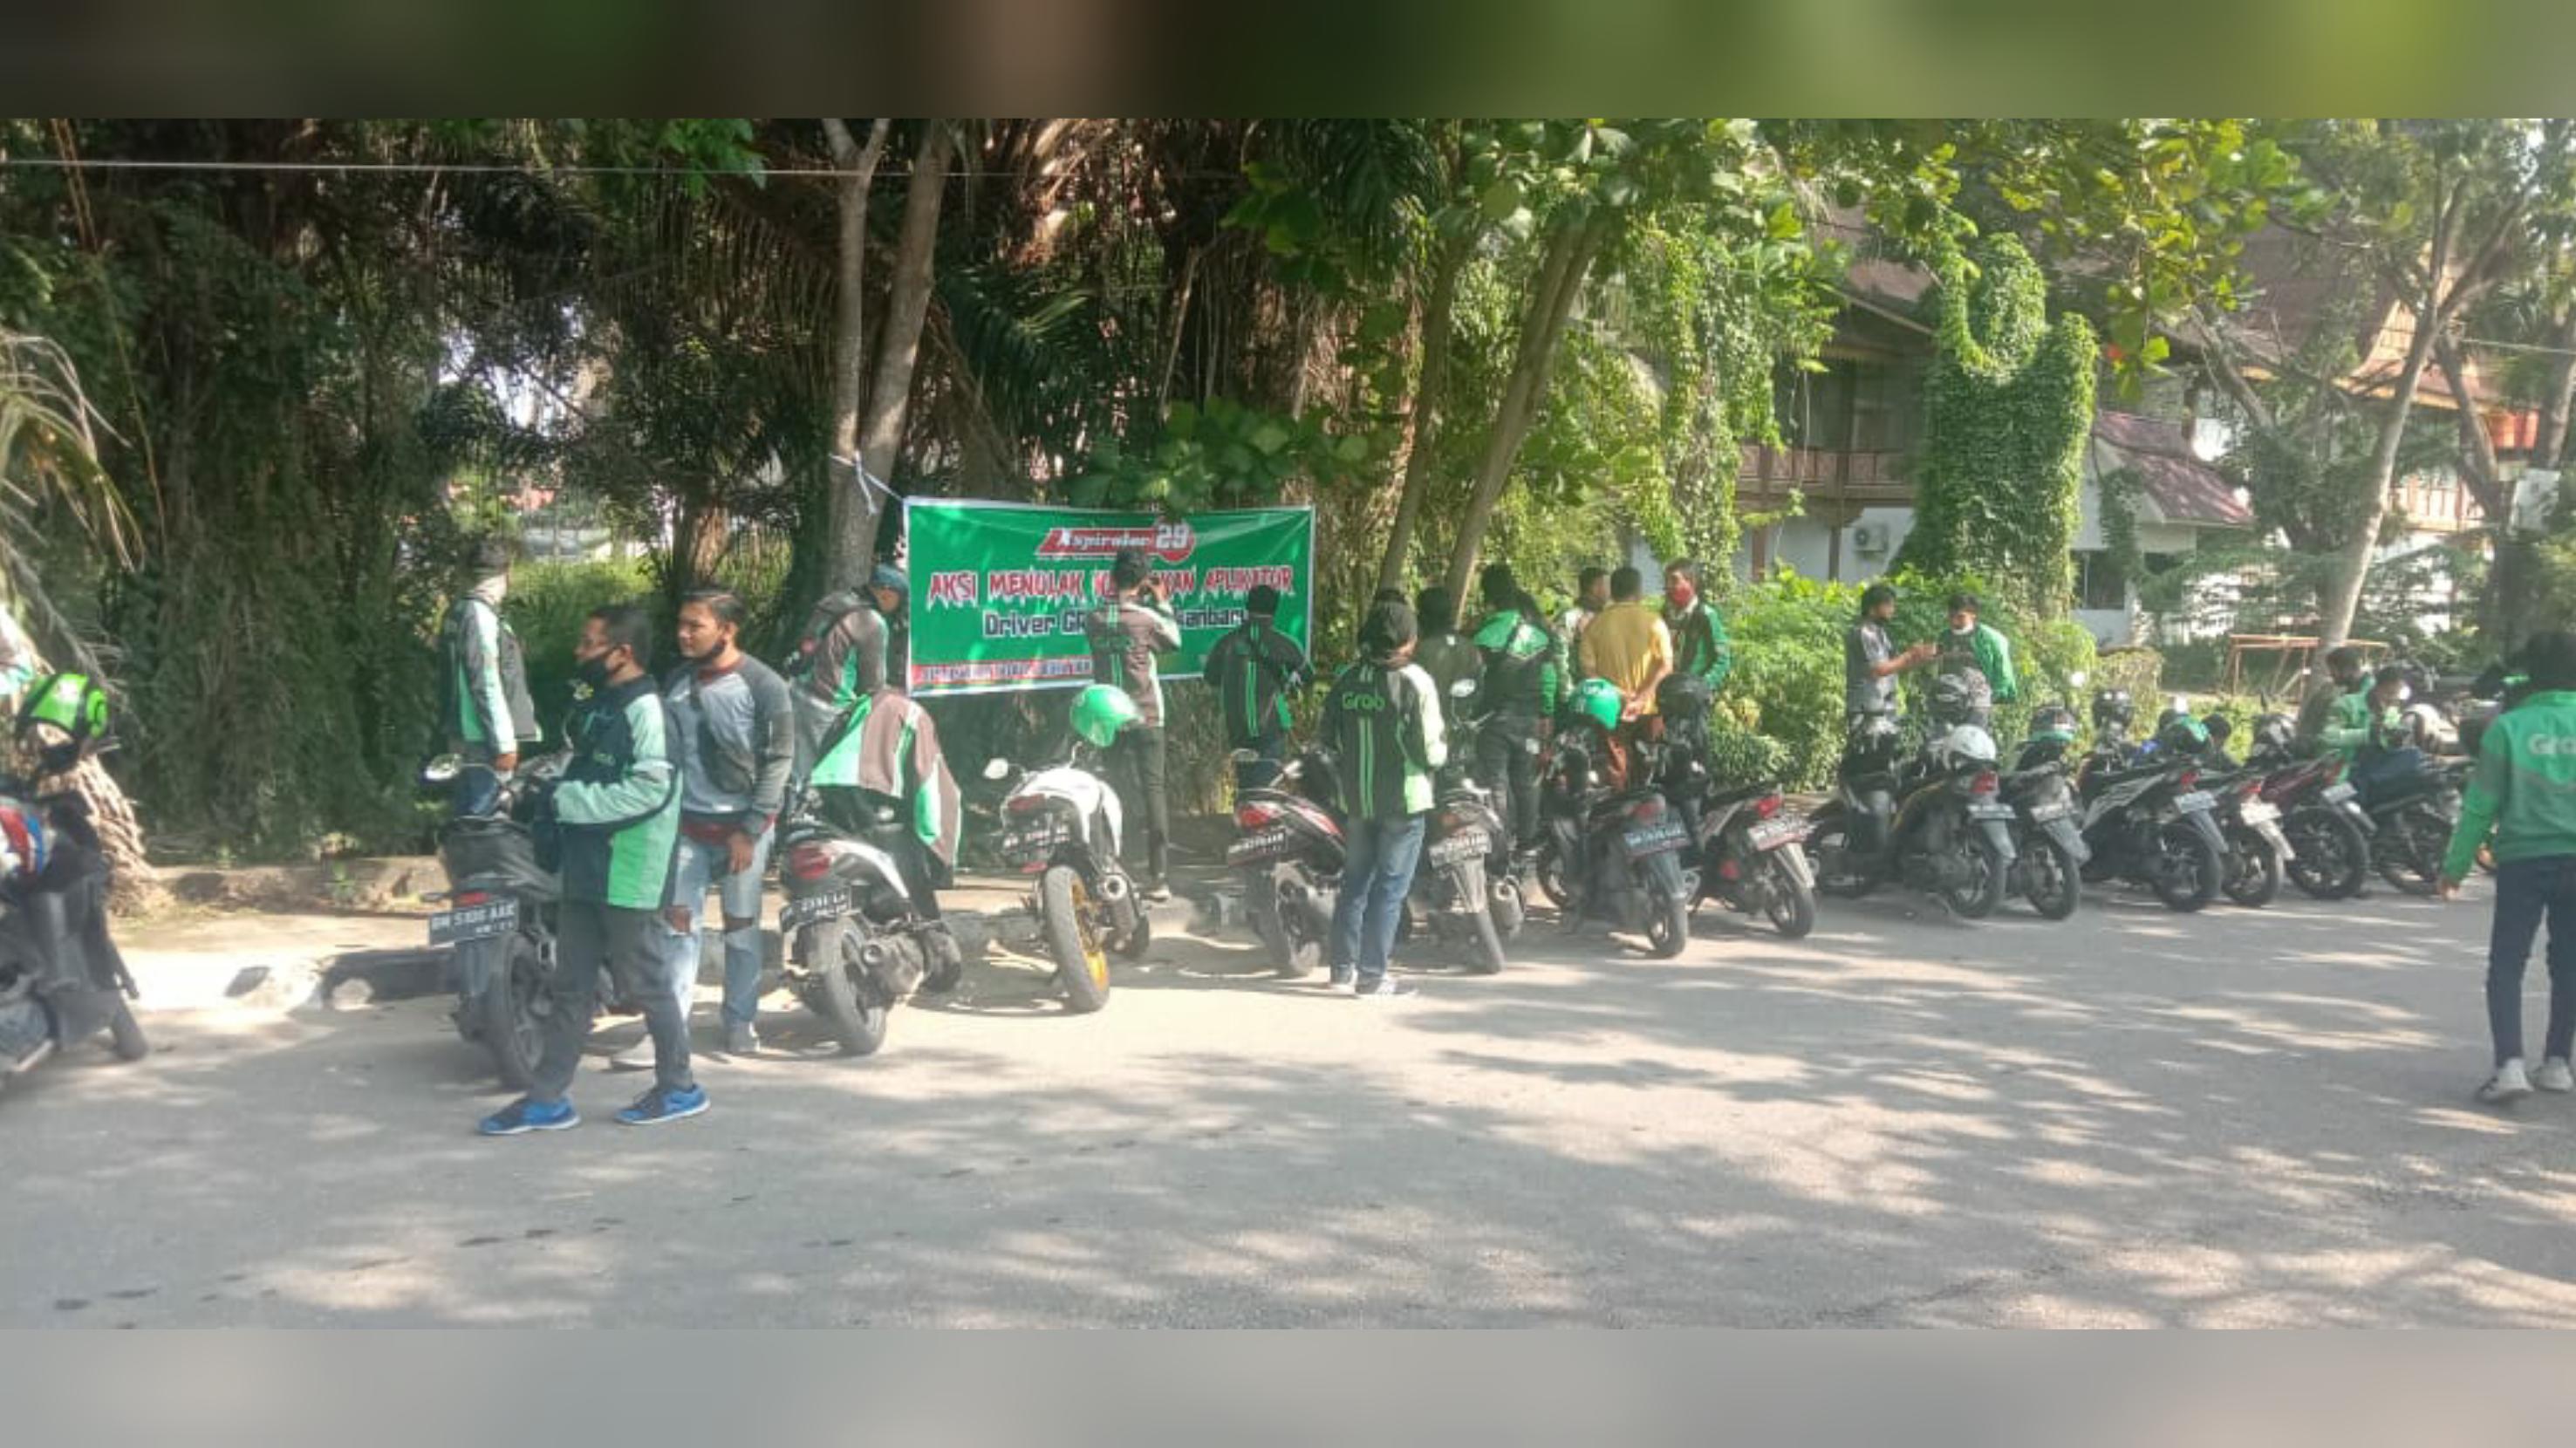 Gara-gara Tuyul, Ratusan Driver Ojol Lakukan Aksi Protes